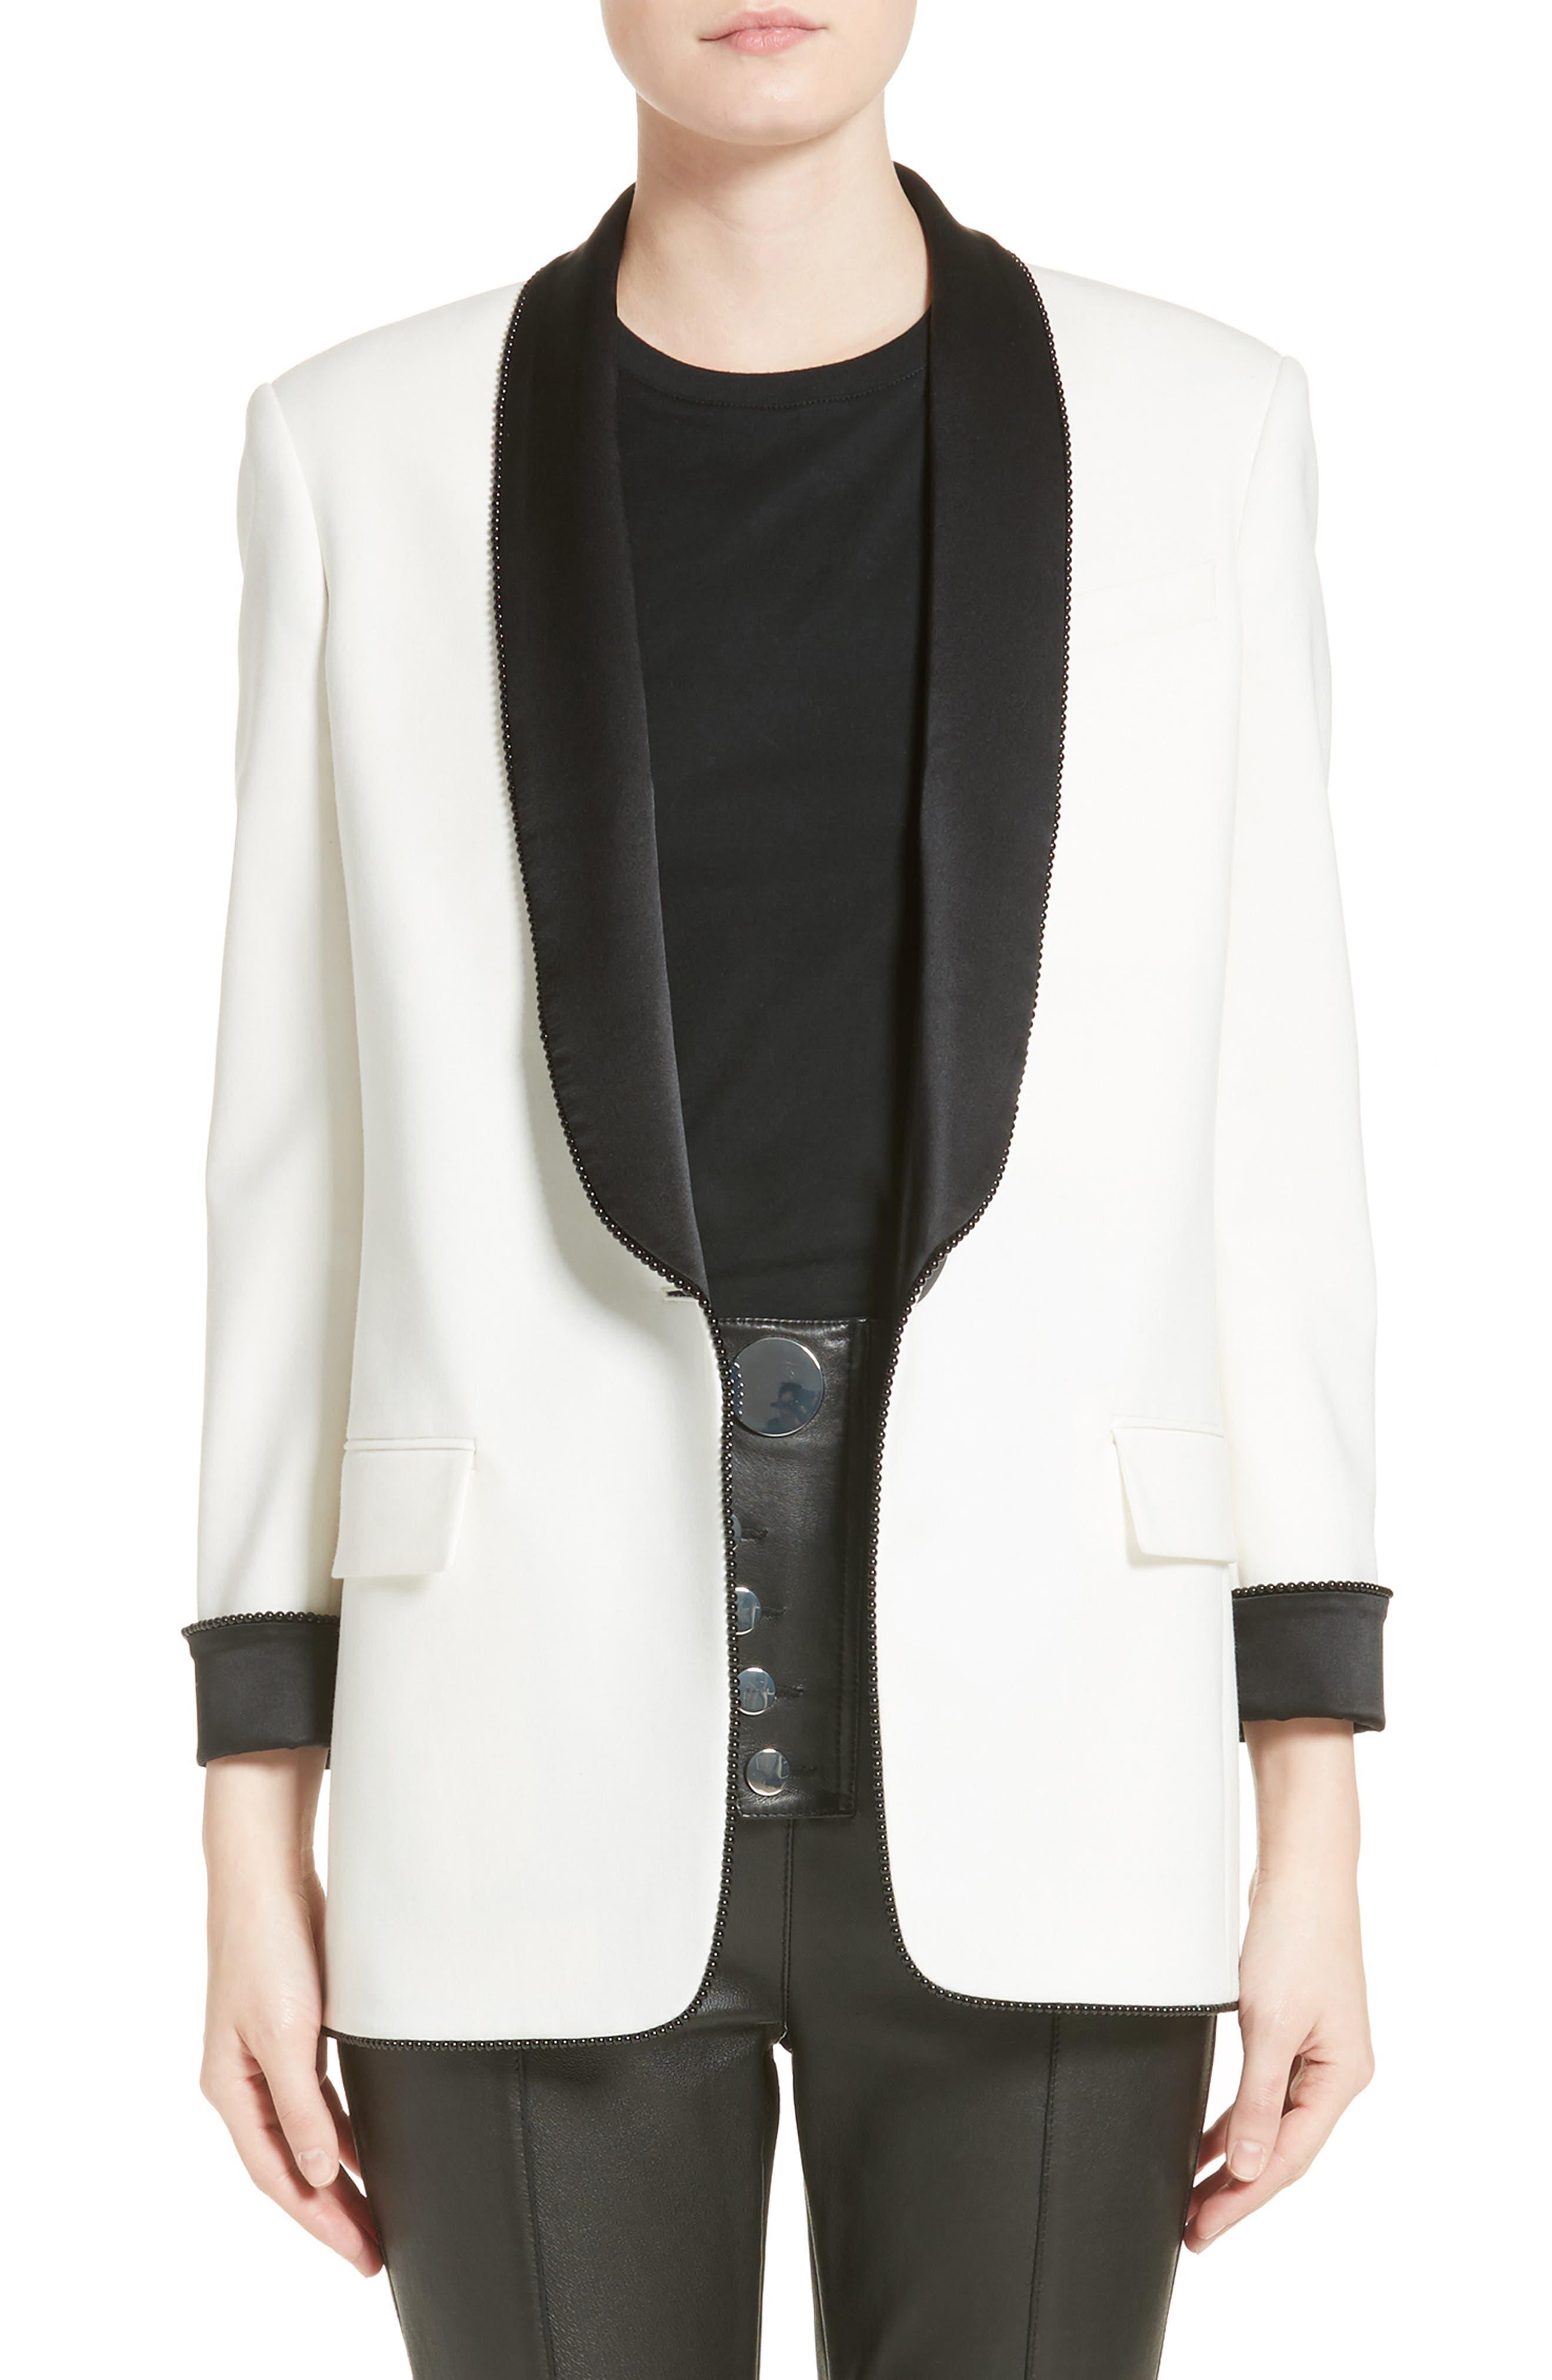 Alternate Image 1 Selected - Alexander Wang Chain Trim Tuxedo Blazer